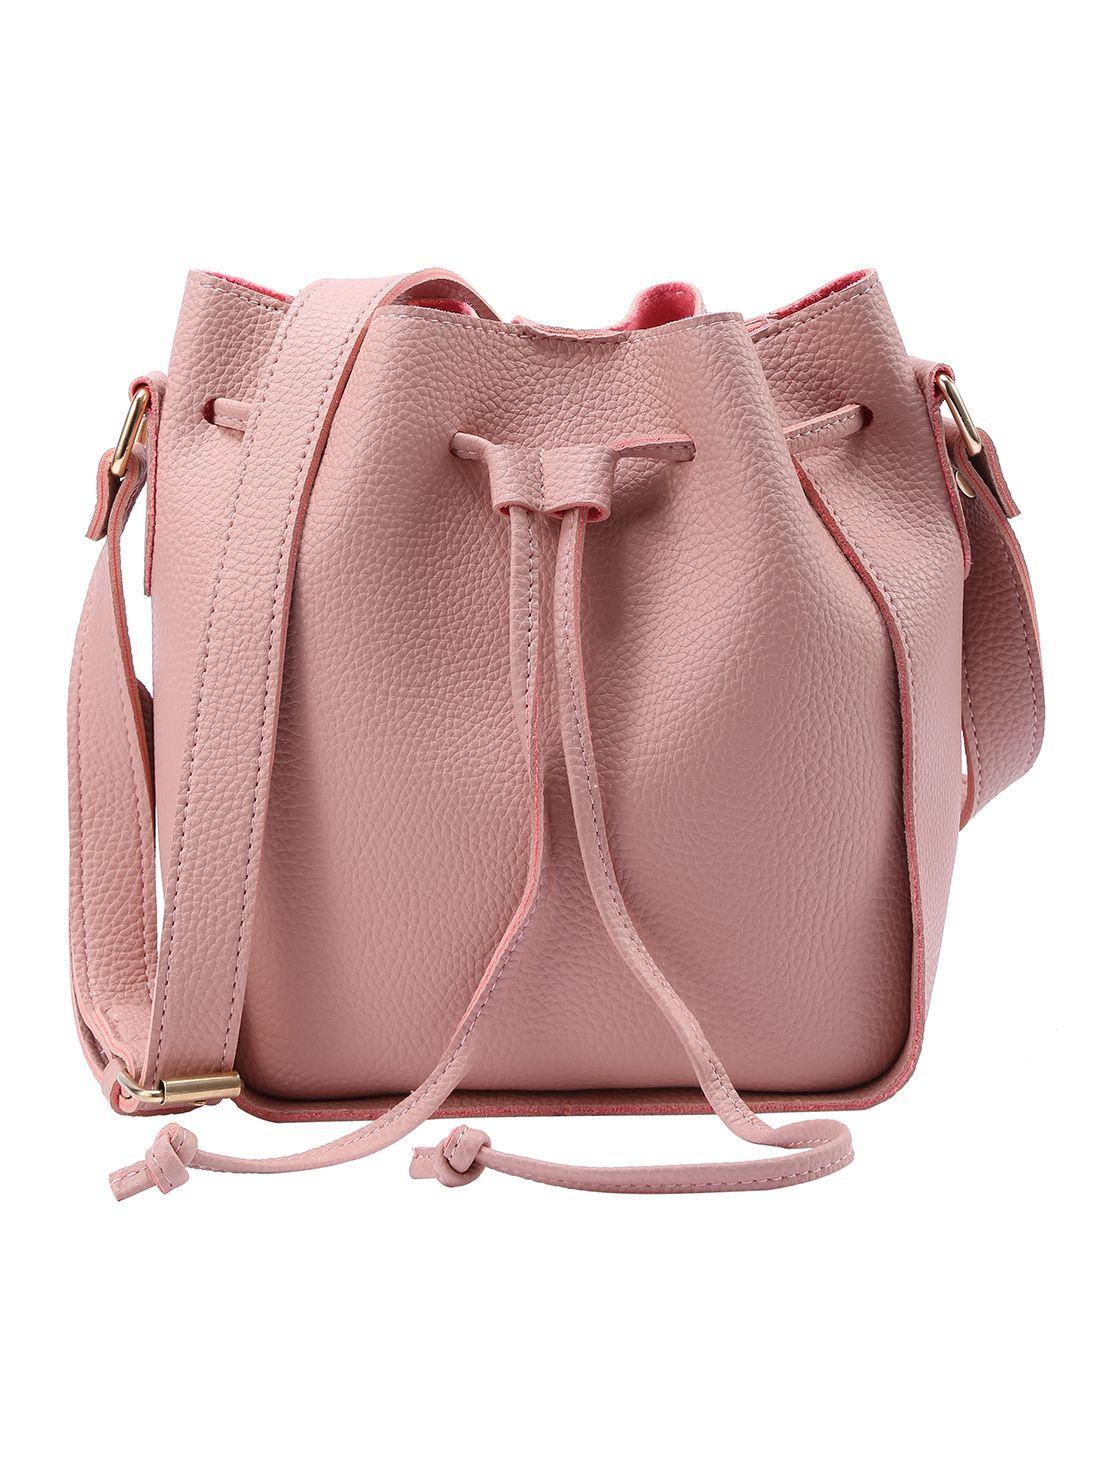 b5c4752456 Embossed Faux Leather Drawstring Bucket Bag - Pink -SheIn(Sheinside ...